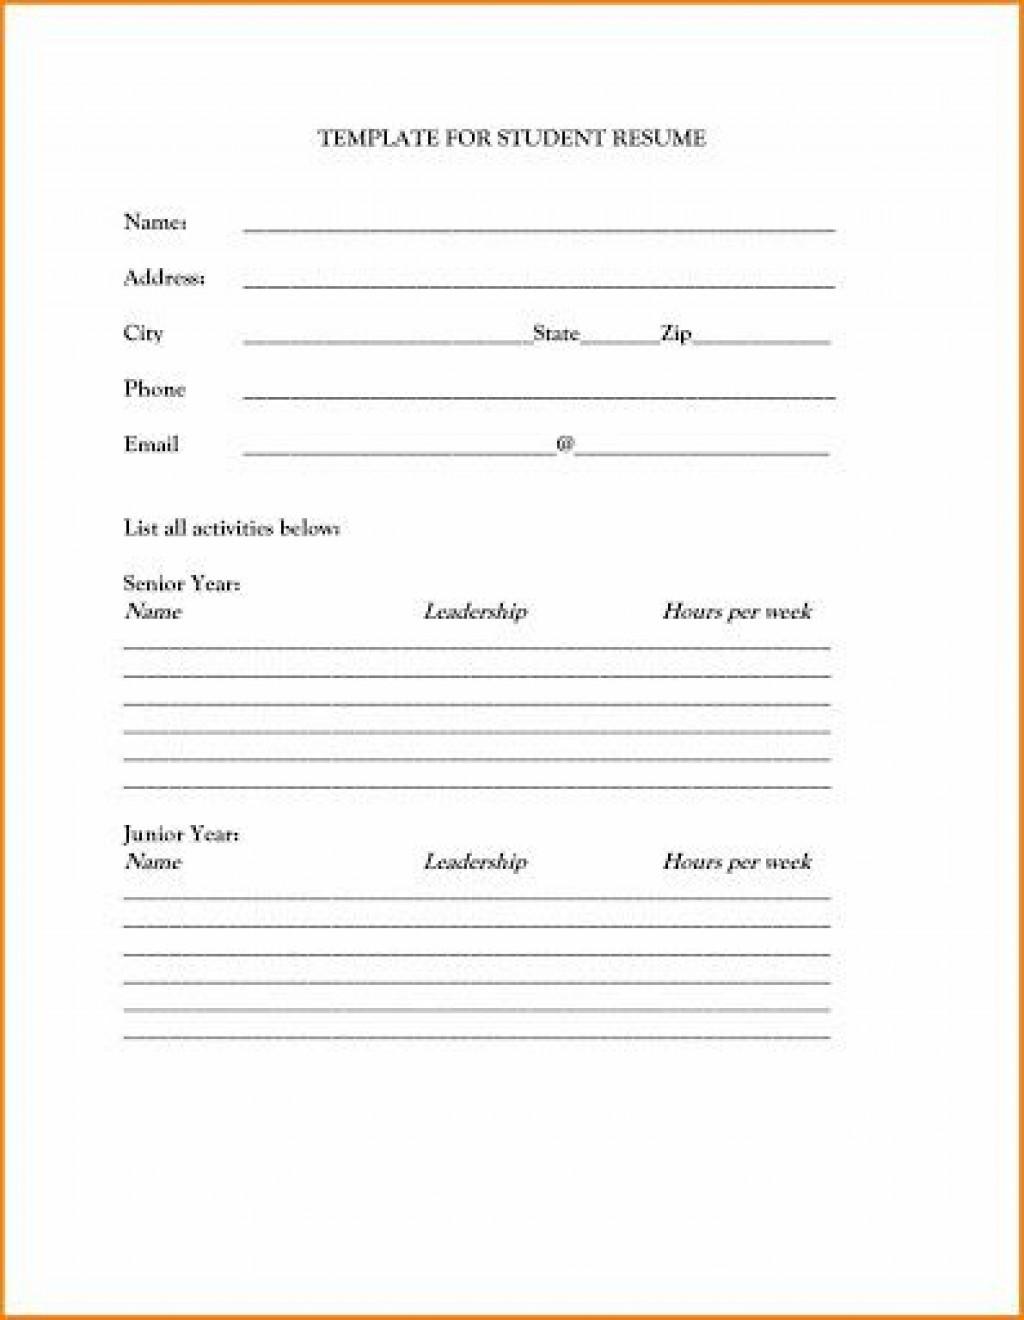 009 Singular Free Basic Blank Resume Template Sample  Templates Word Printable To PrintLarge